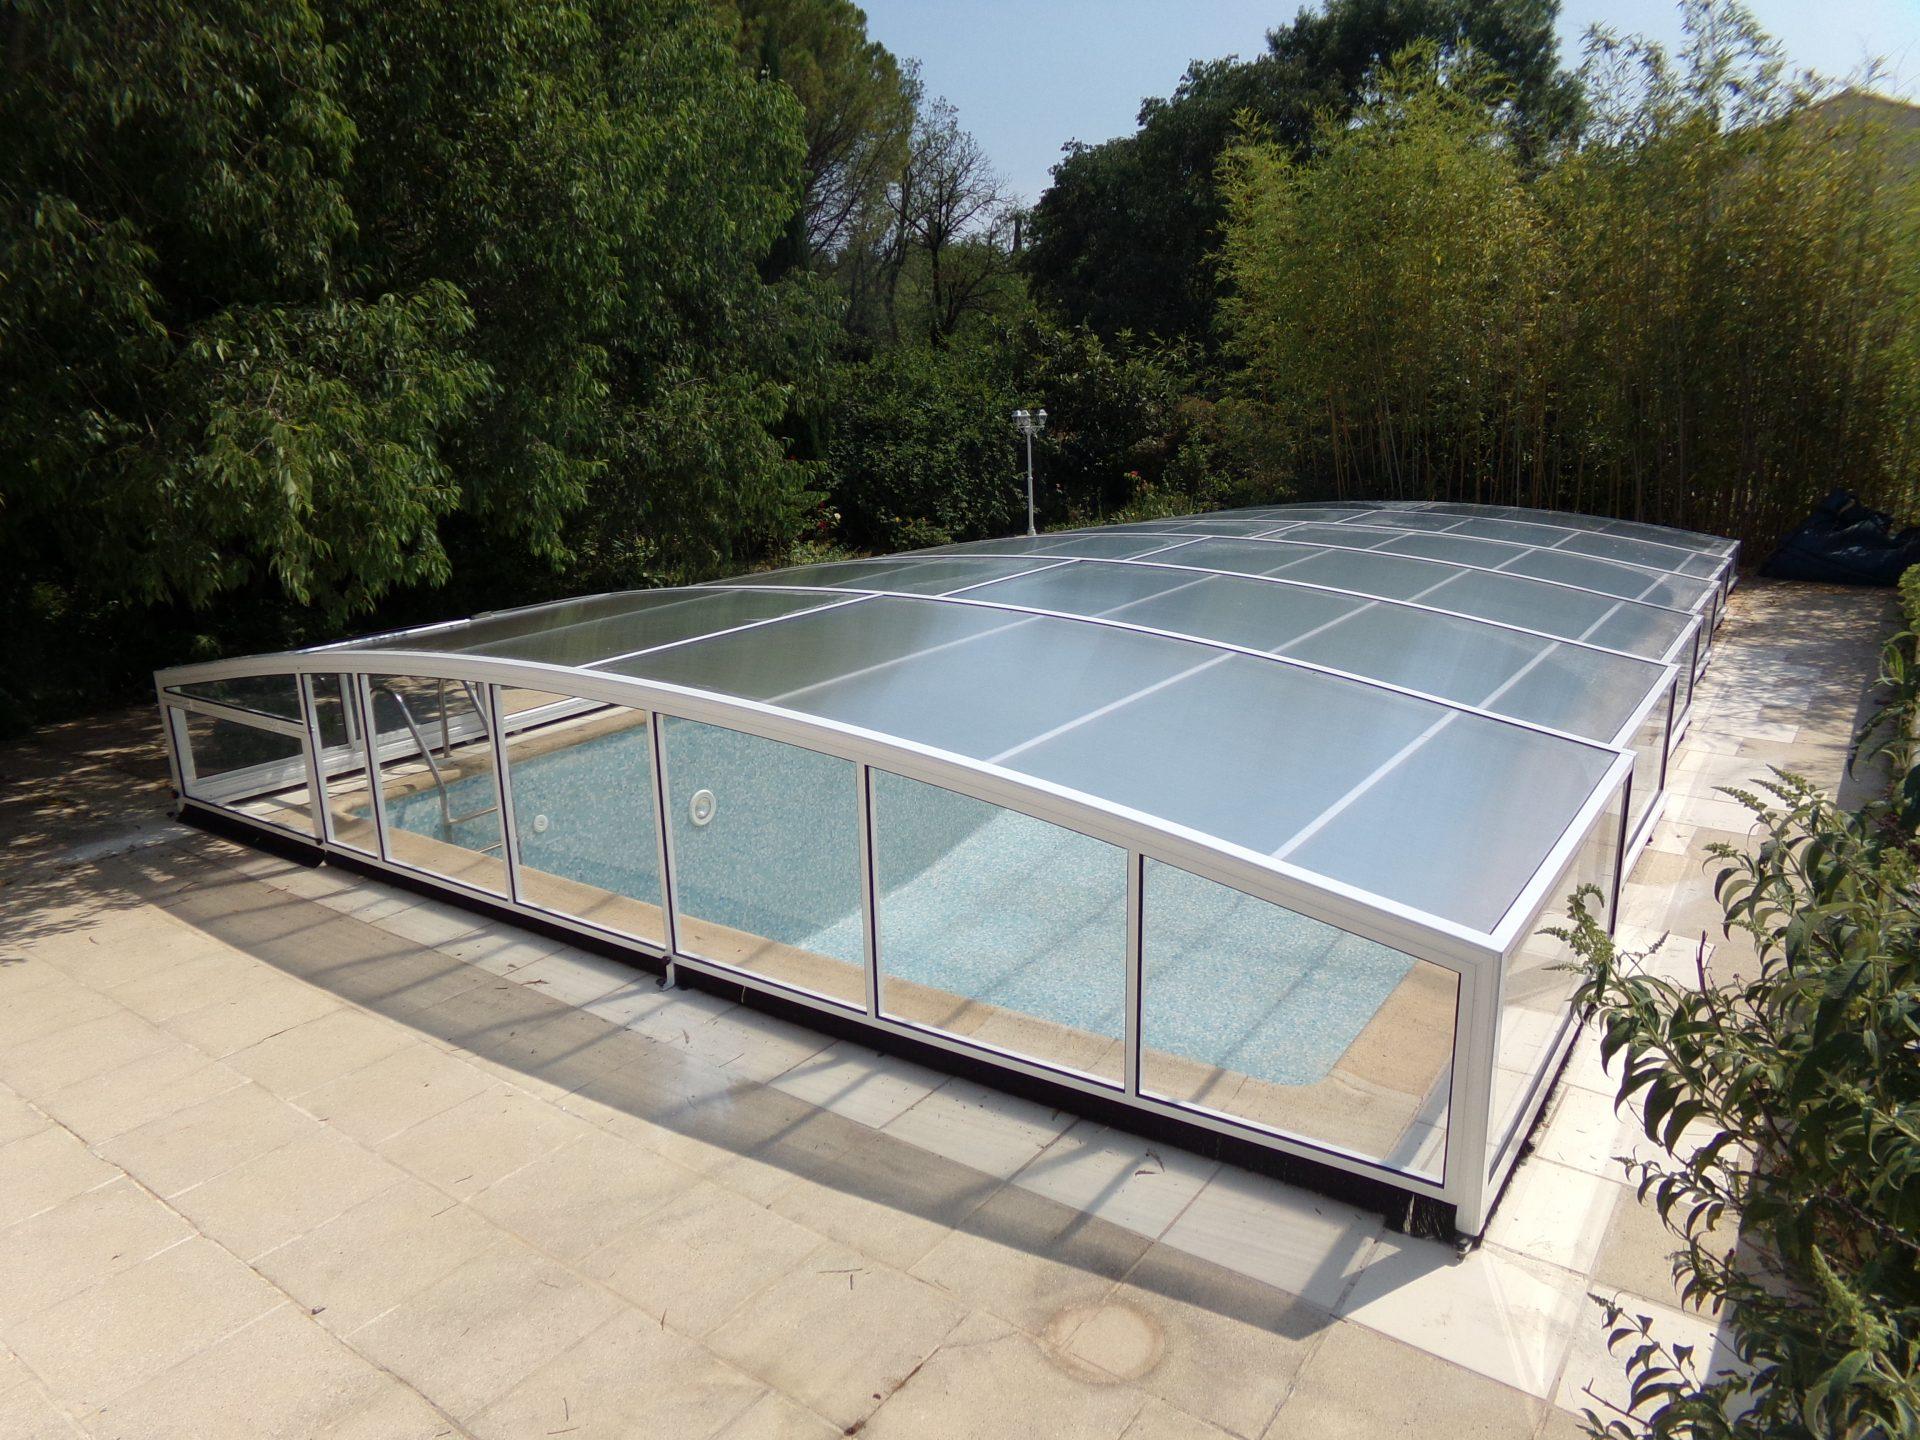 fabricant d 39 abri piscine montpellier h rault bel abri. Black Bedroom Furniture Sets. Home Design Ideas